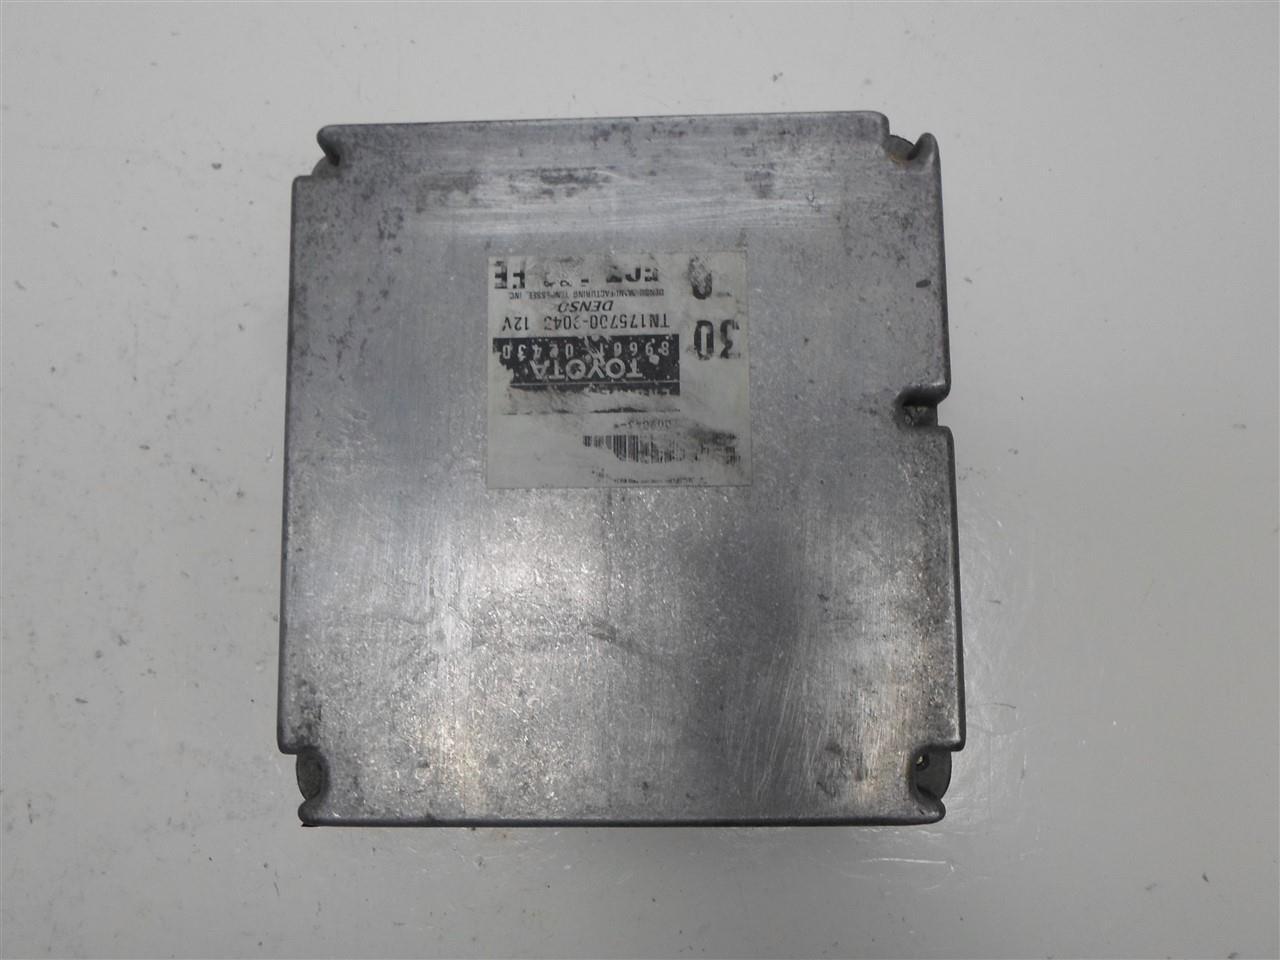 98 TOYOTA COROLLA AUTO CALIF ECU ECM COMPUTER NUMBER 89661-02430